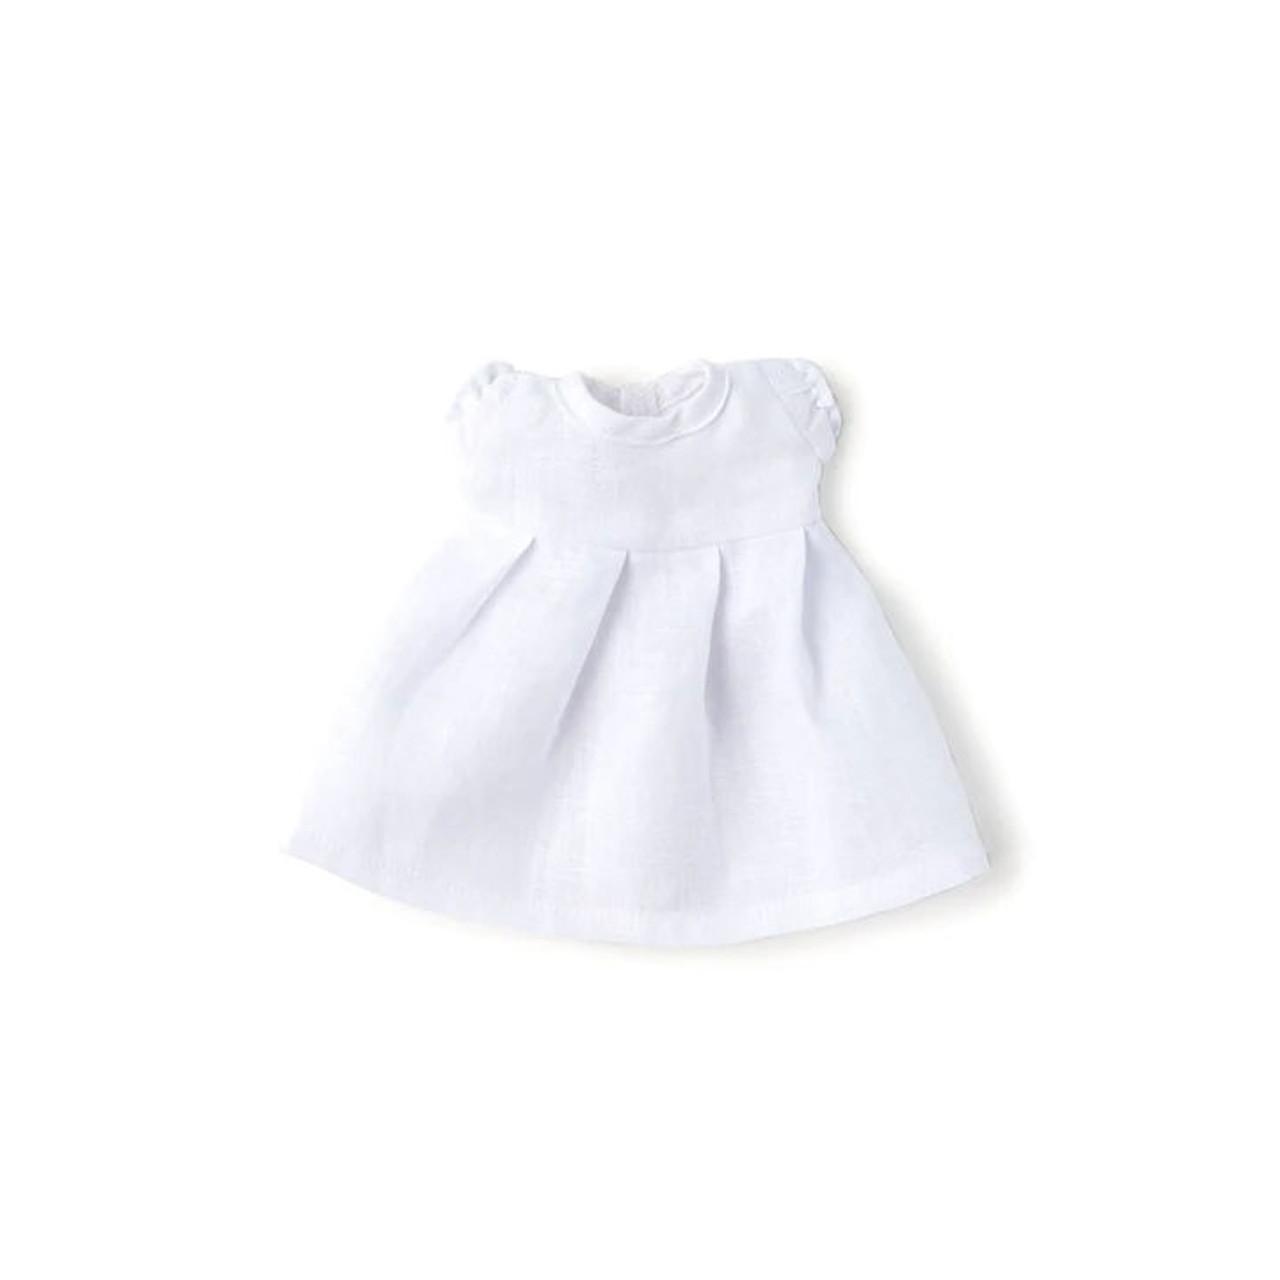 Organic Doll Clothes - White Linen Dress